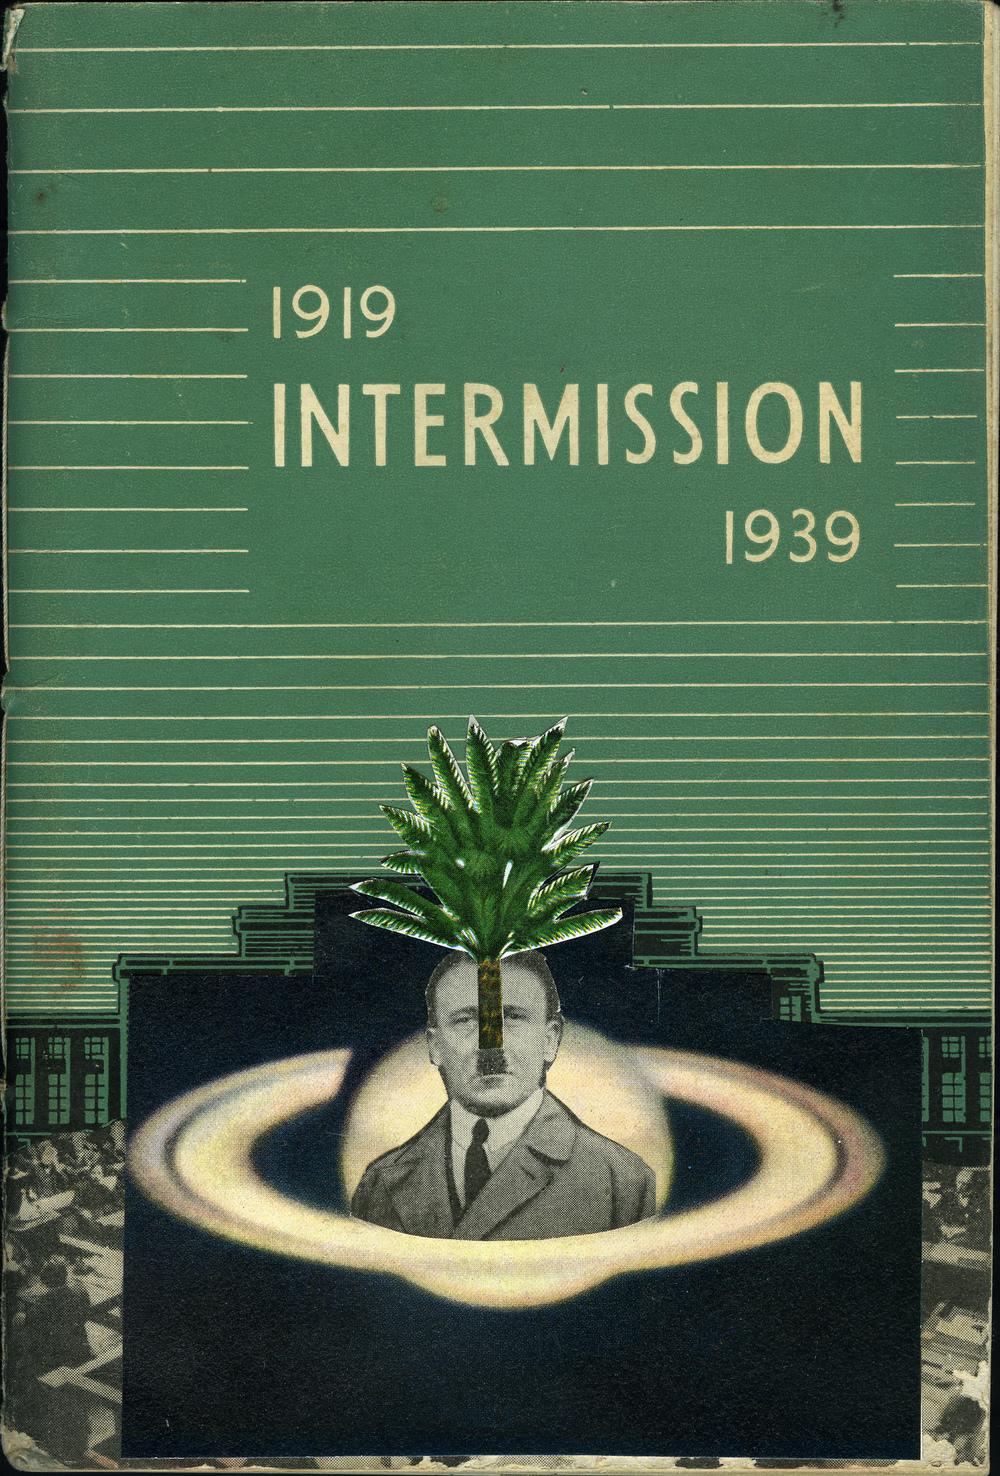 Intermission, 2009.